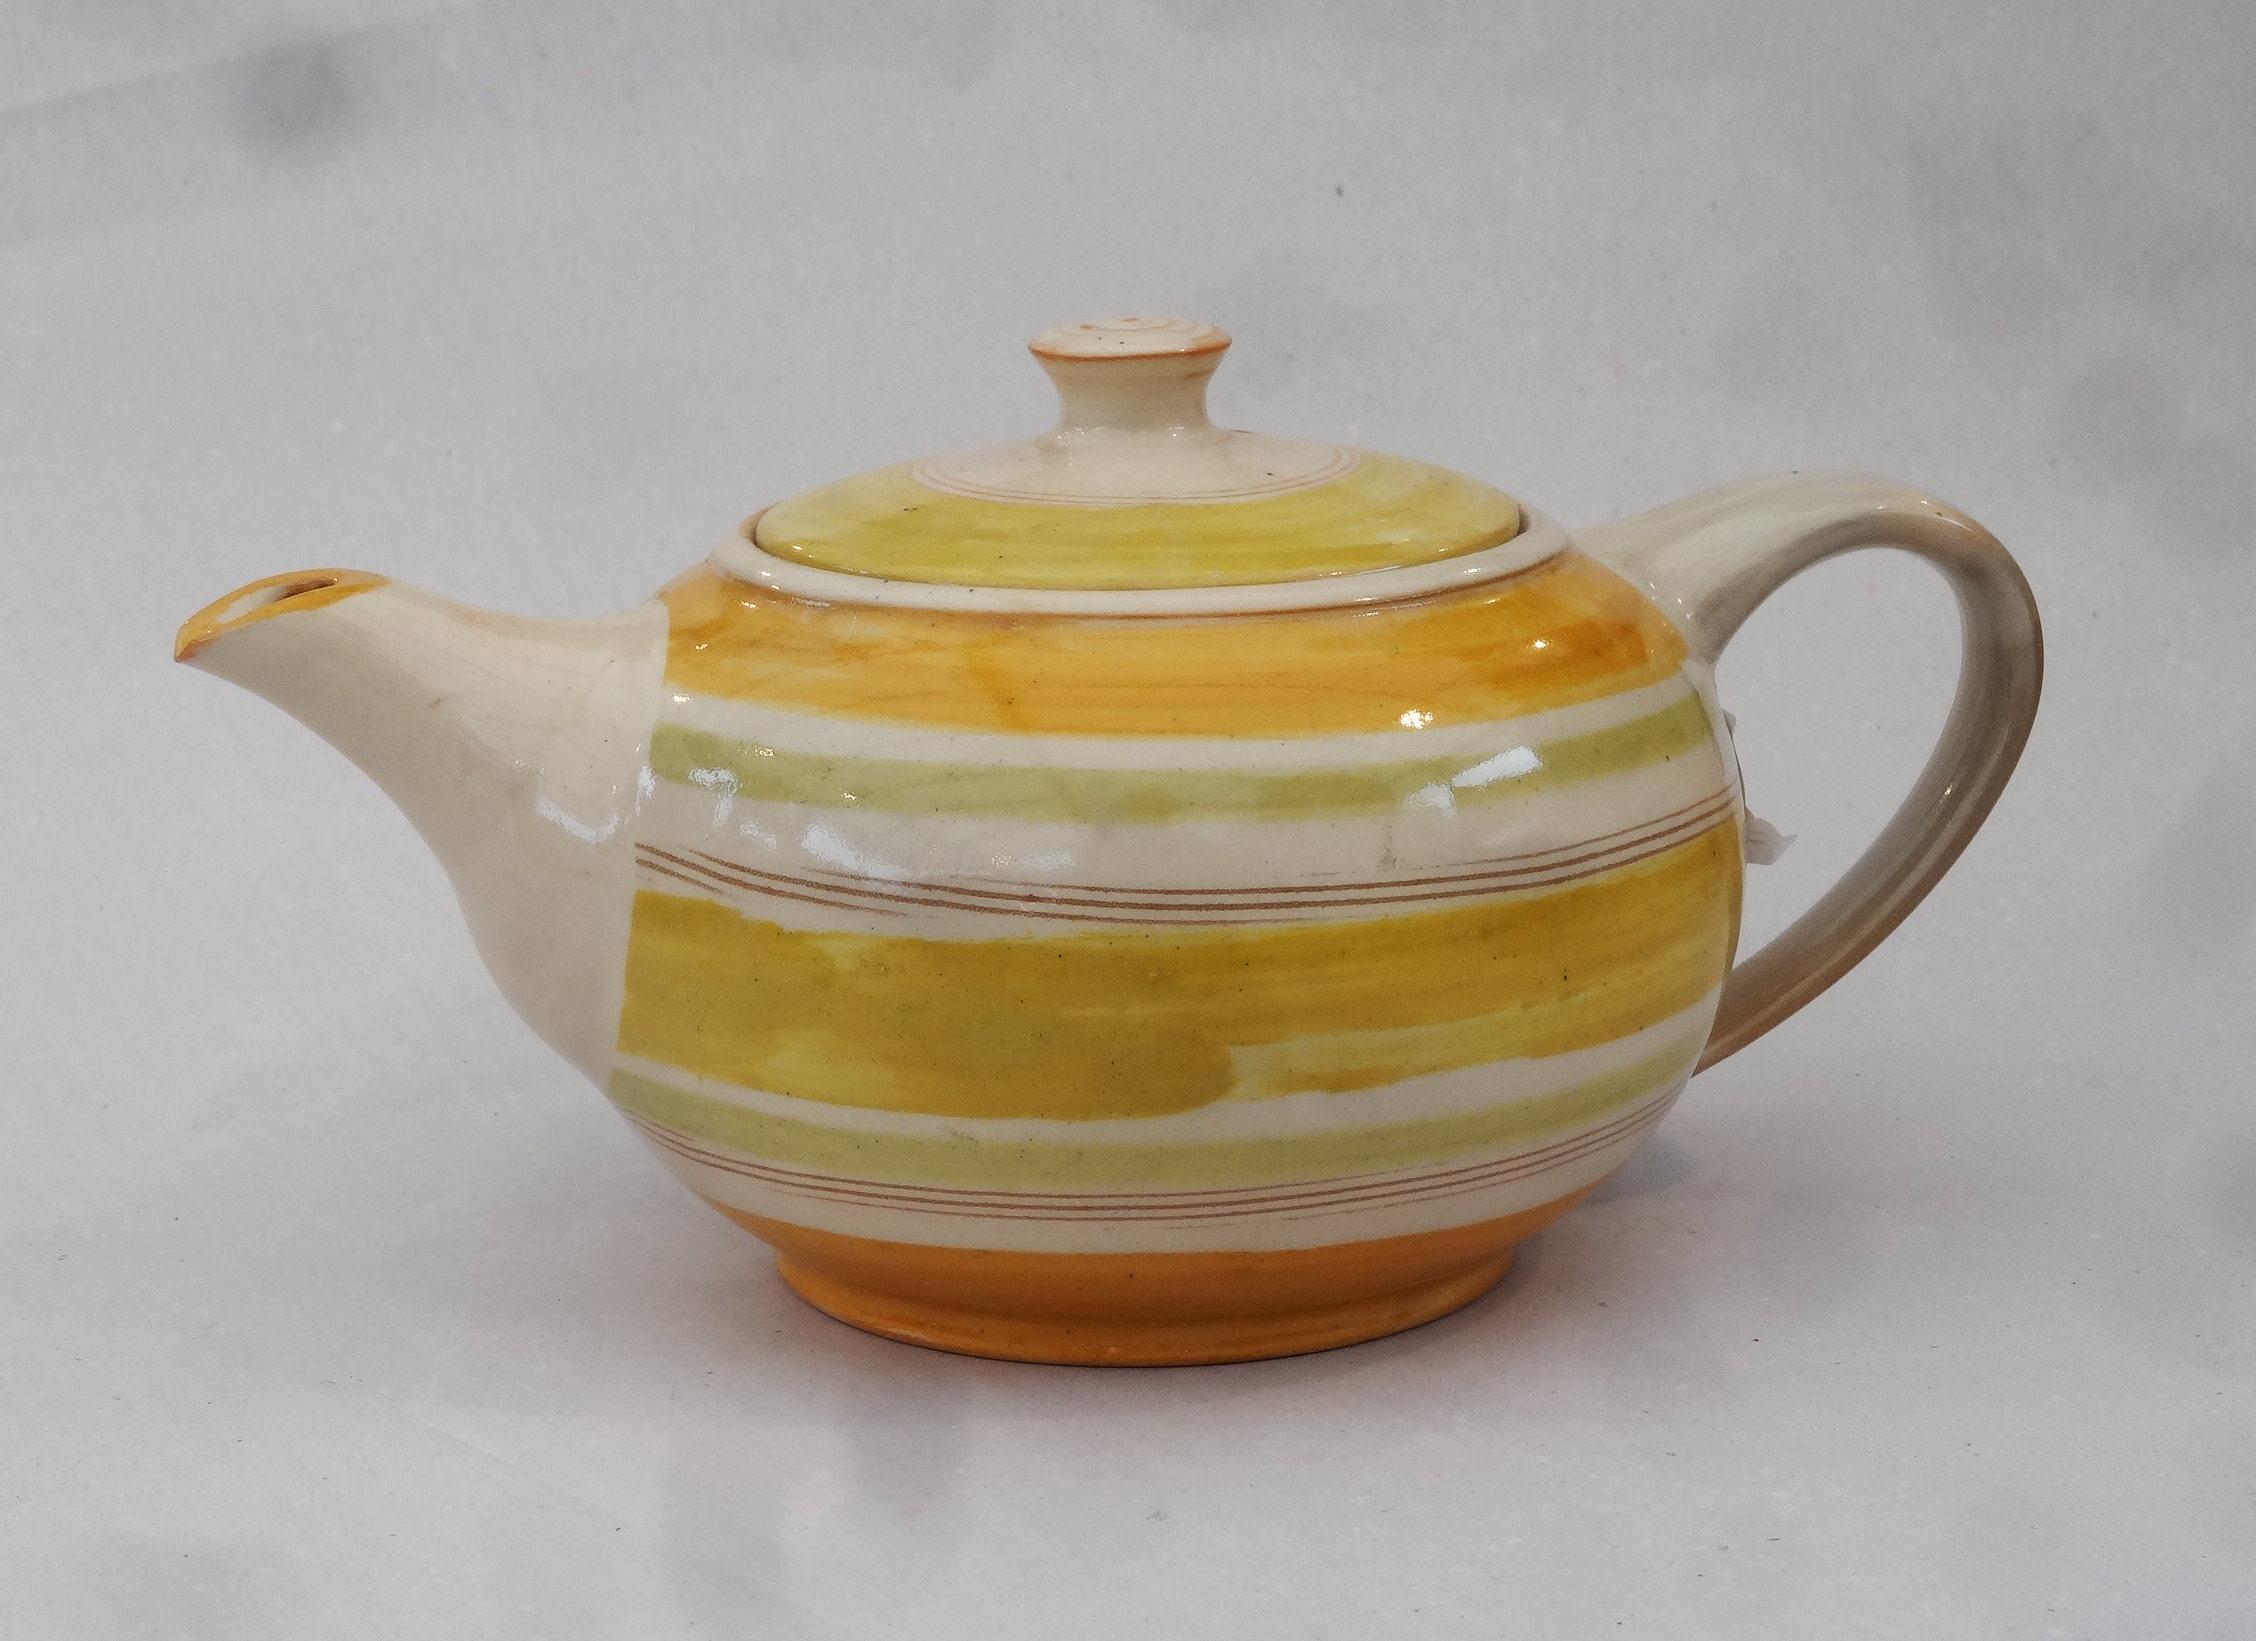 Teekanne gelb gestreift